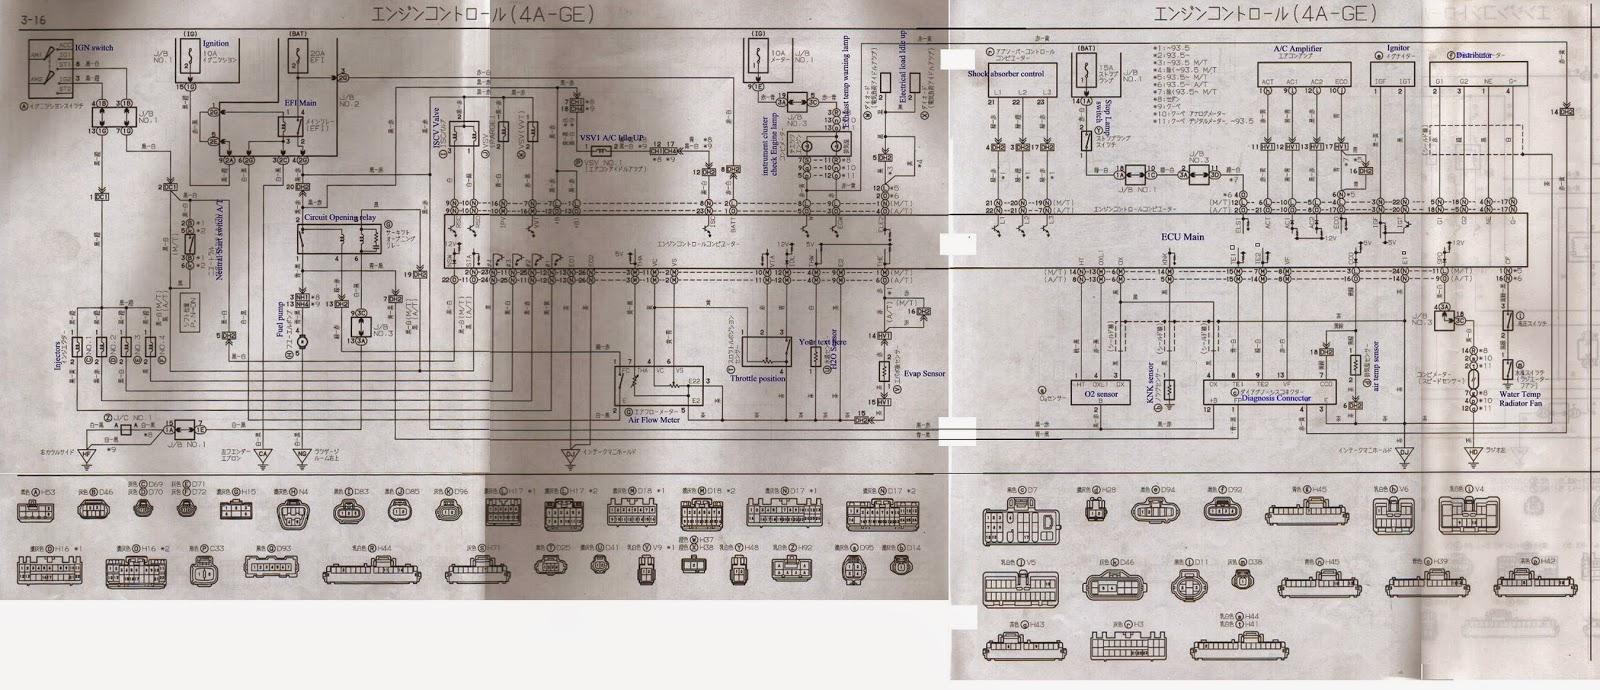 Glanza ecu wiring diagram